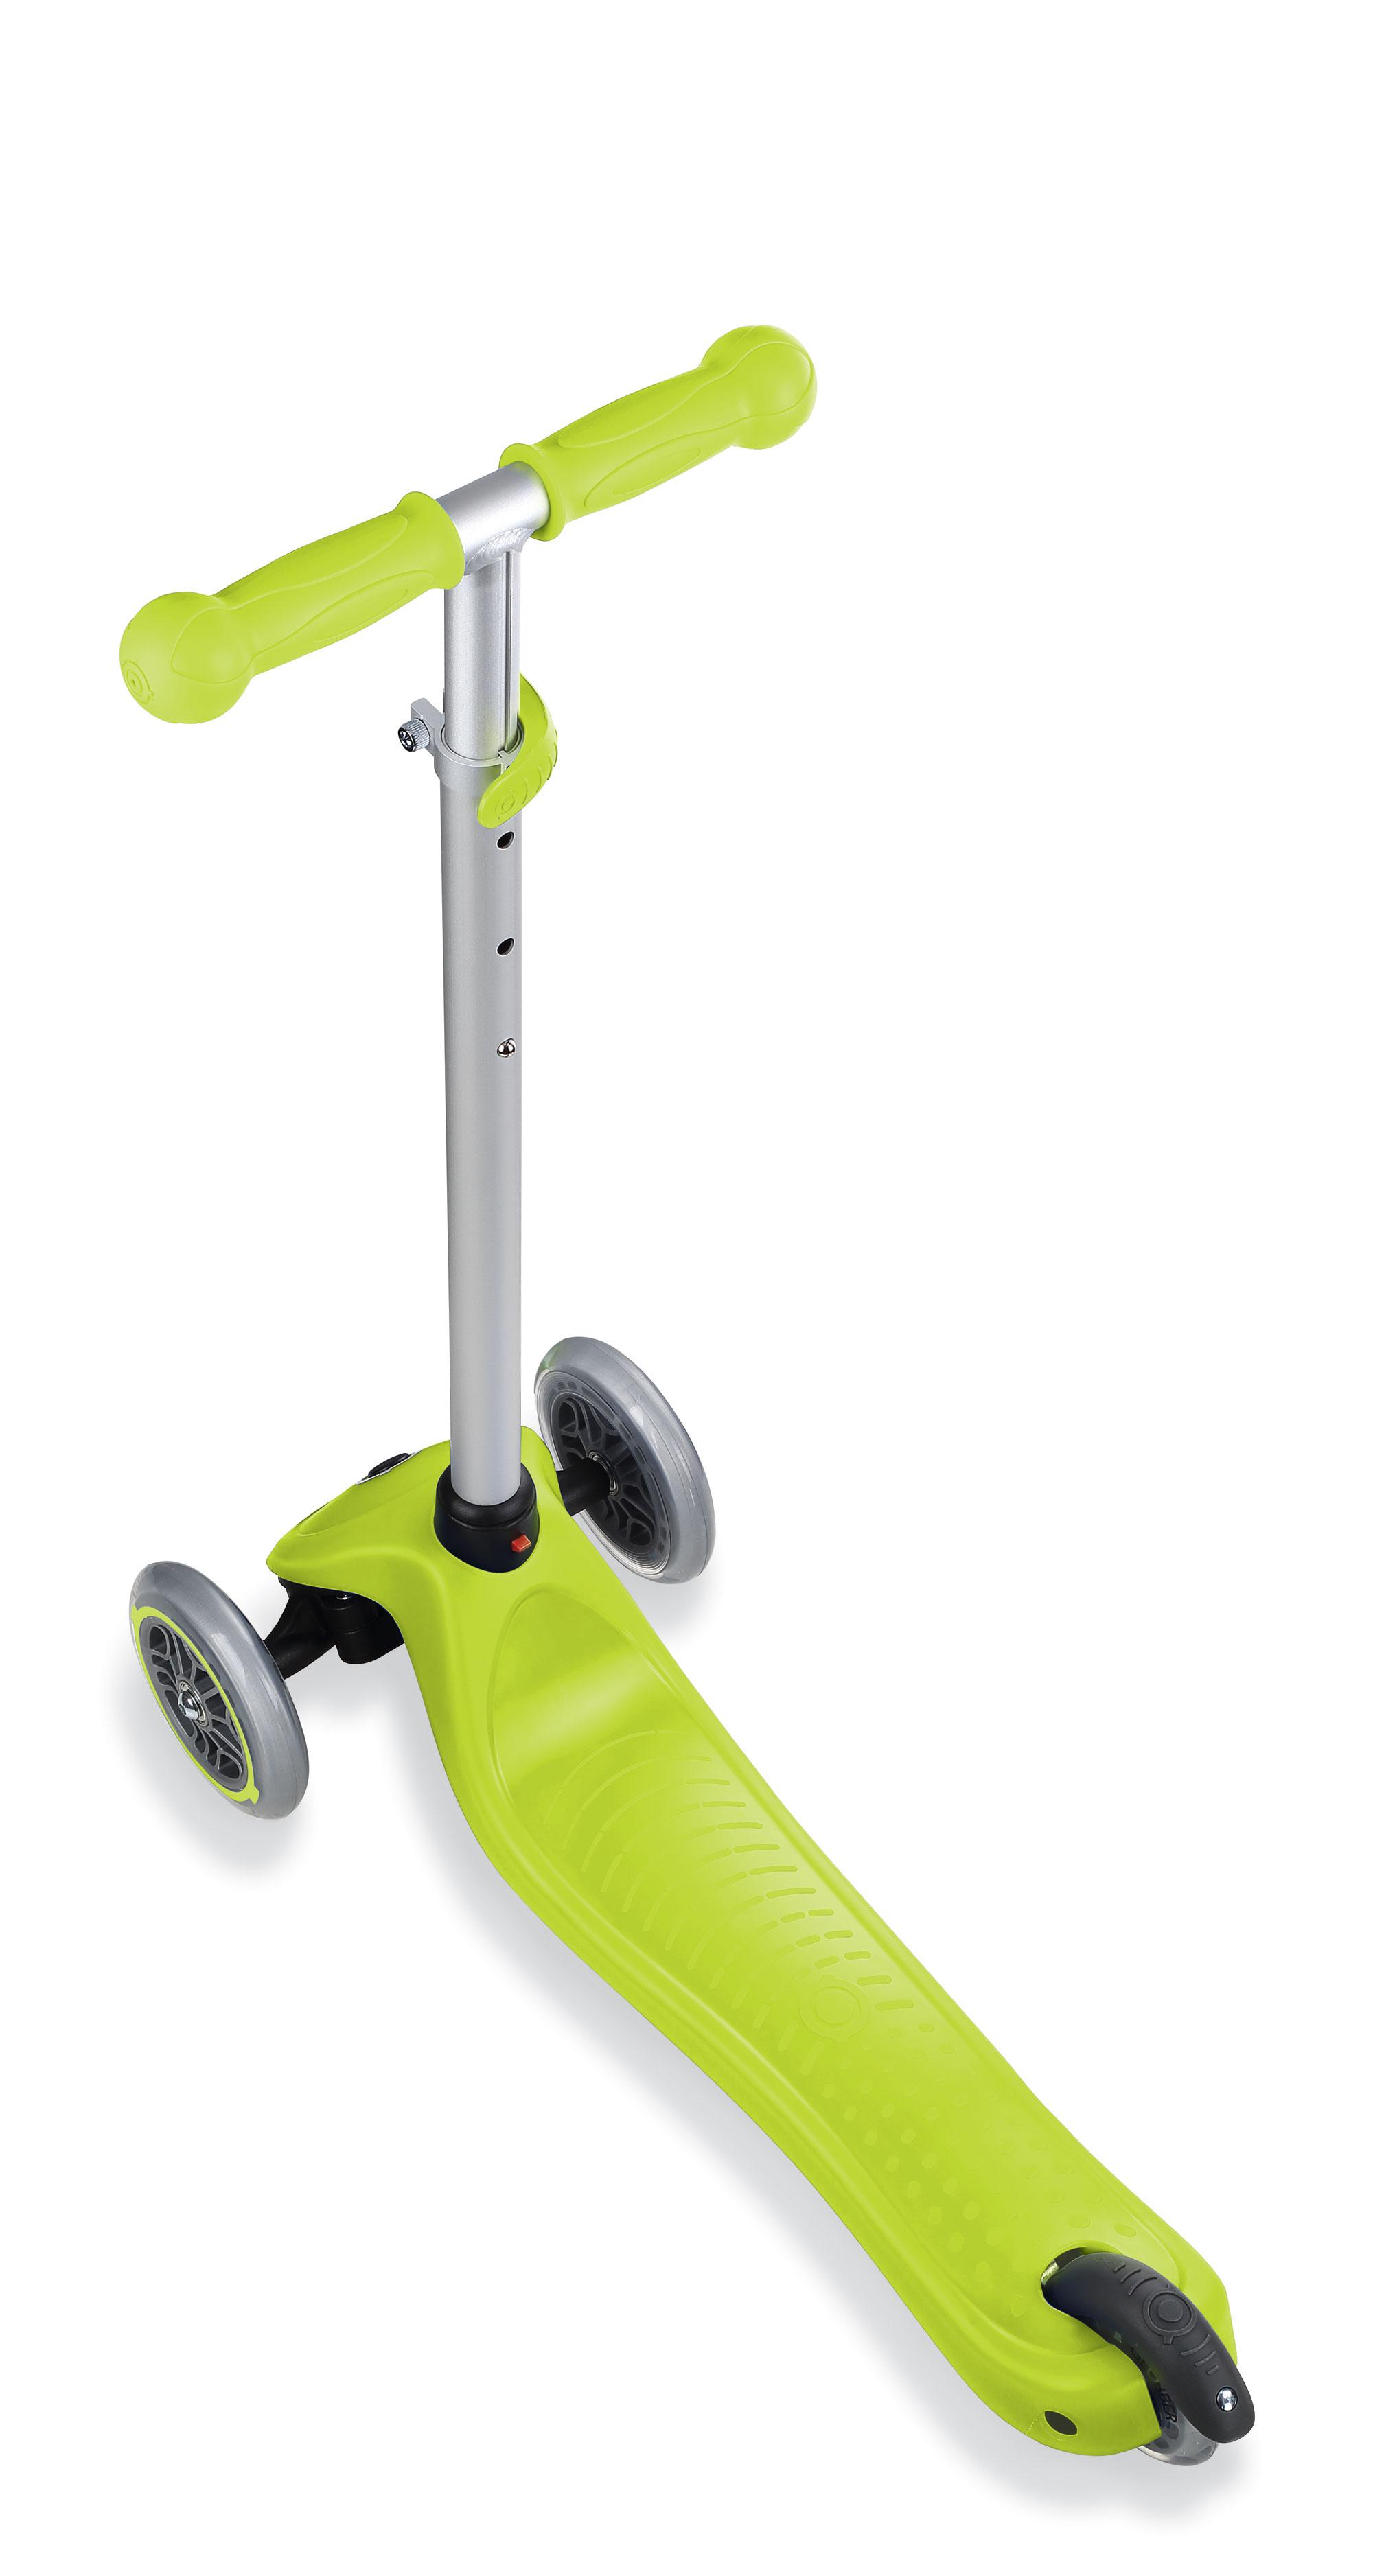 Scooter / Kinderroller / Dreirad / Laufrad Globber Evo 4in1 grün Set Bild 4